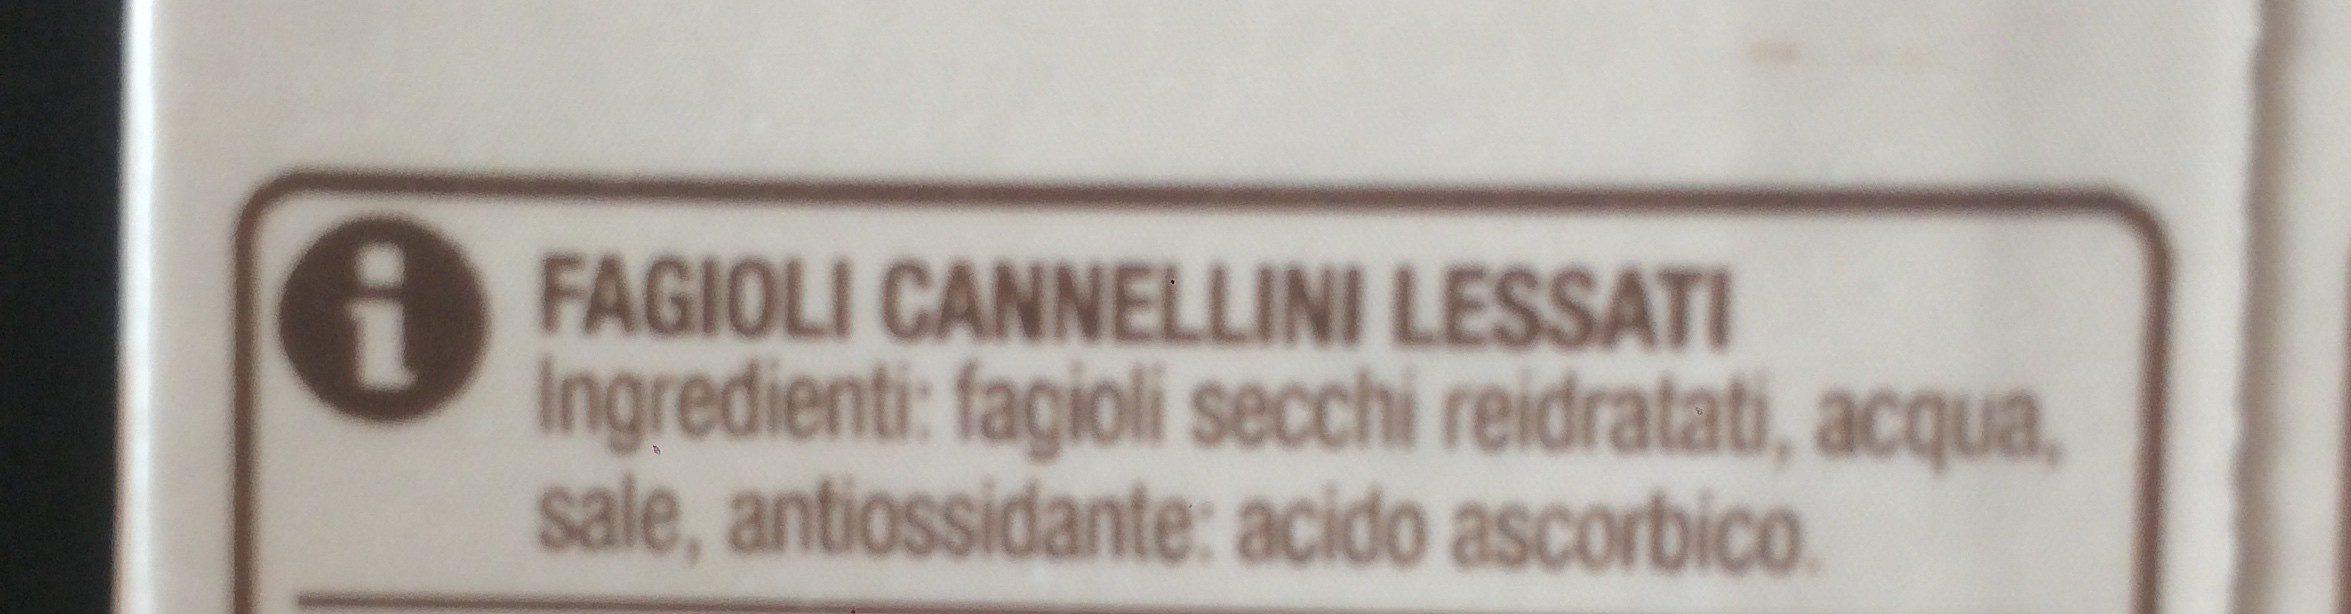 Fagioli cannellini - Ingrédients - fr